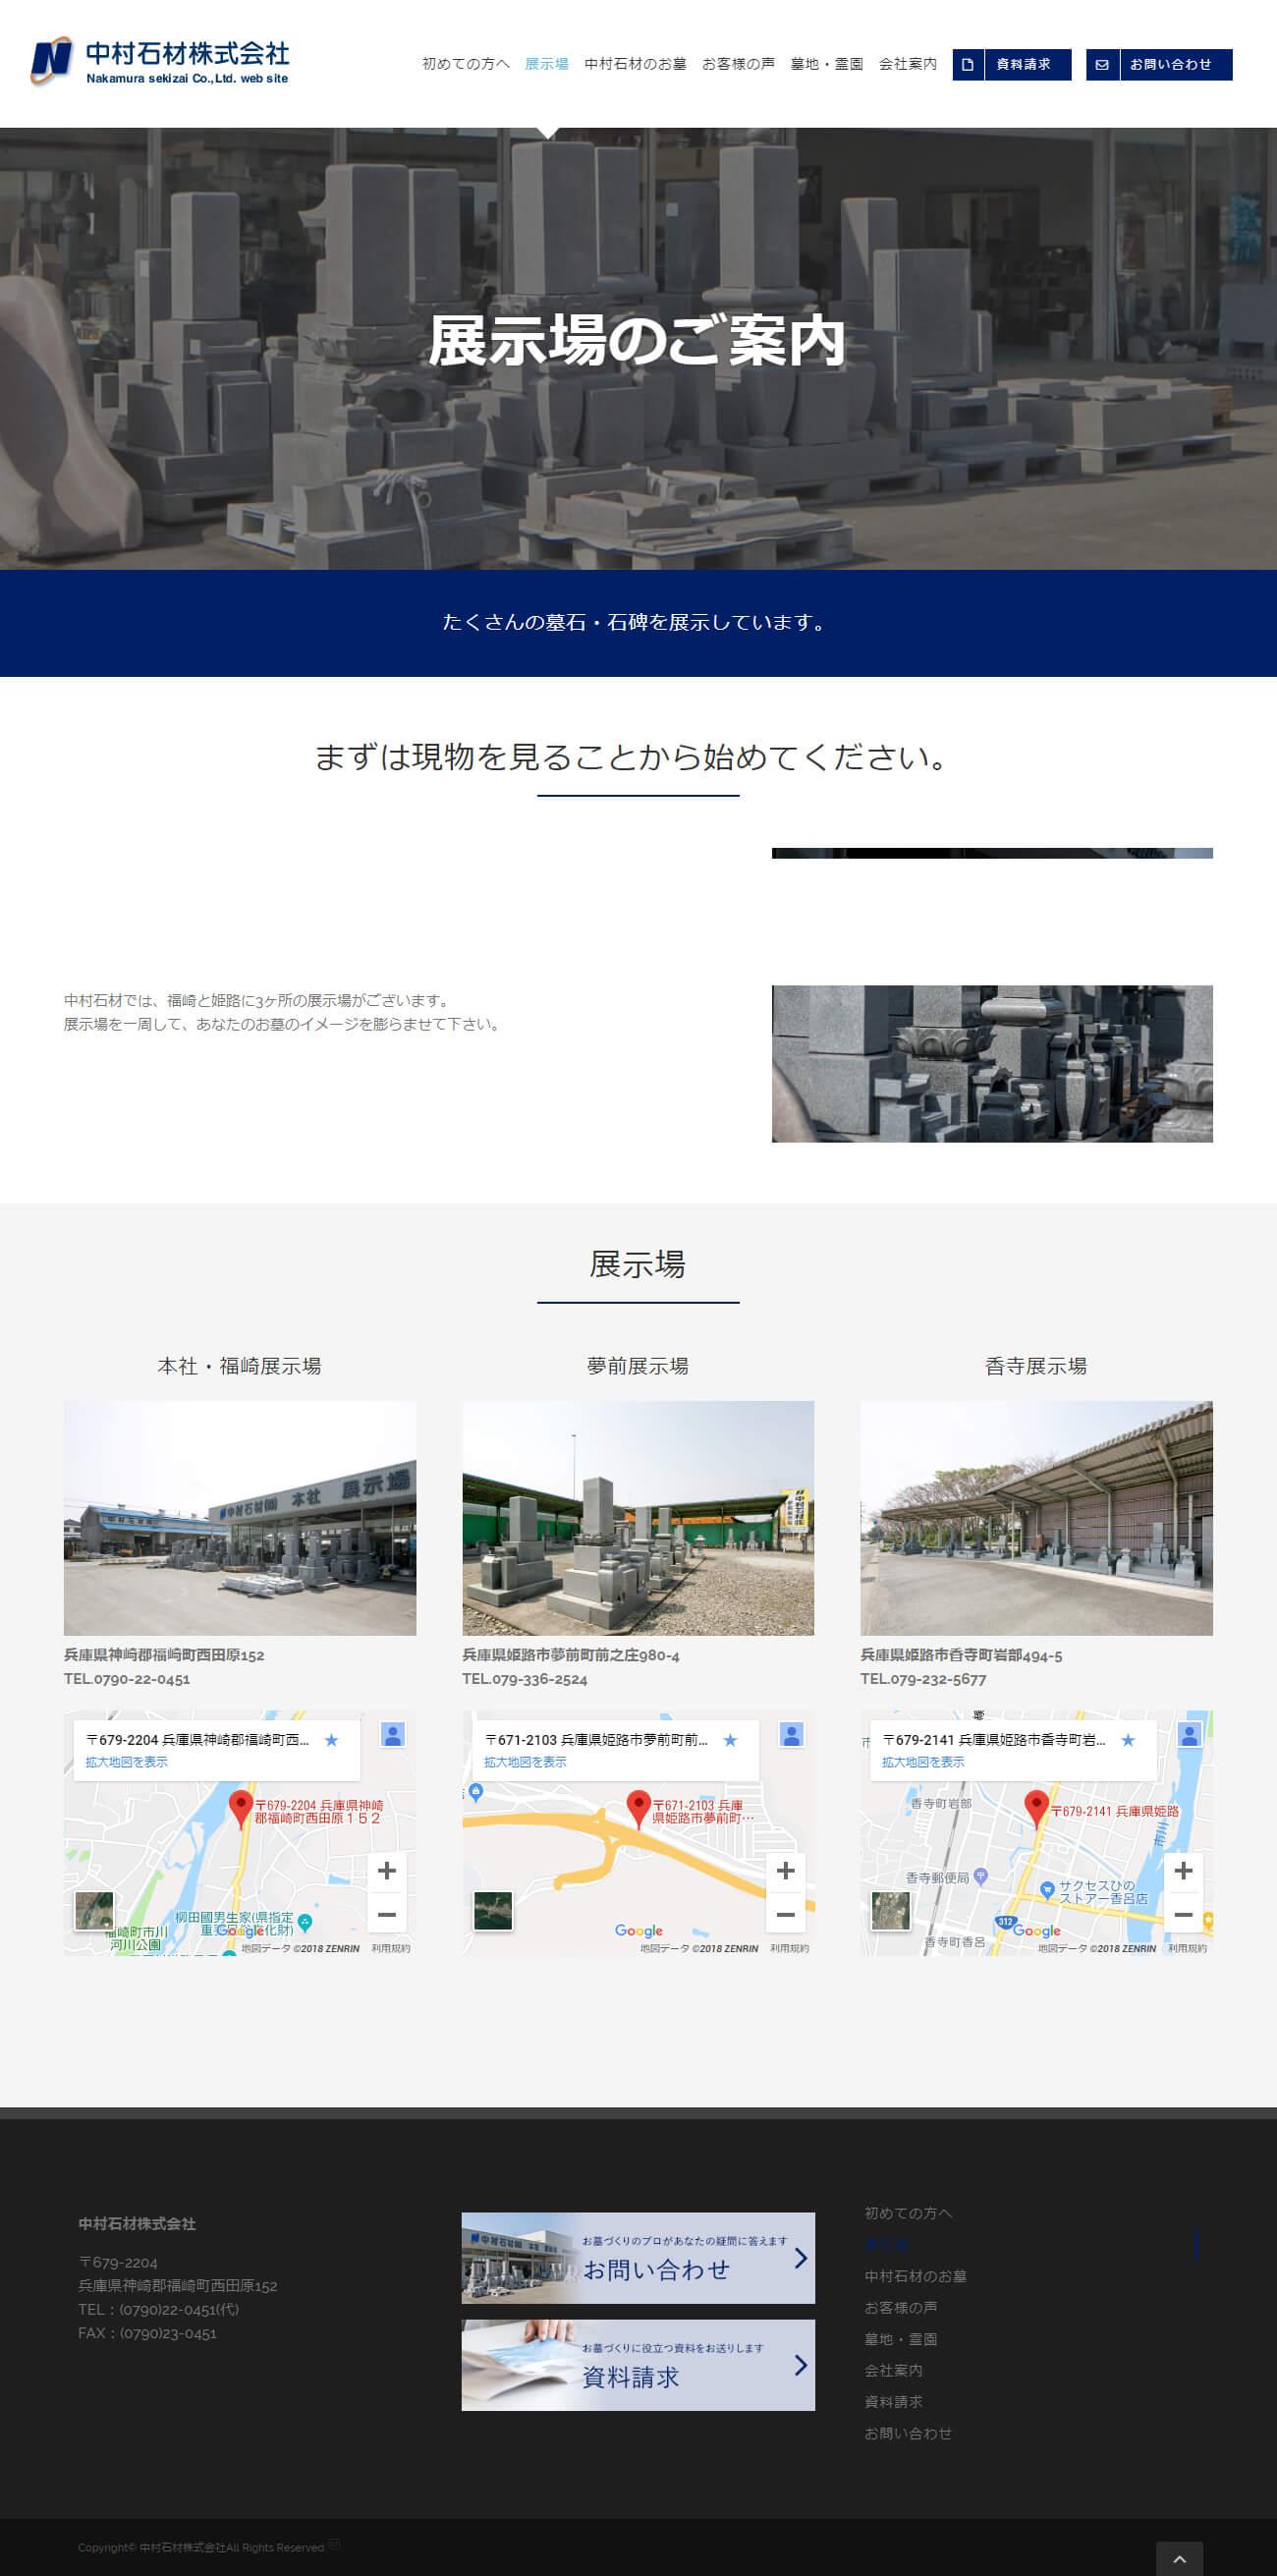 神崎郡福崎町 中村石材株式会社様 ホームページ制作2